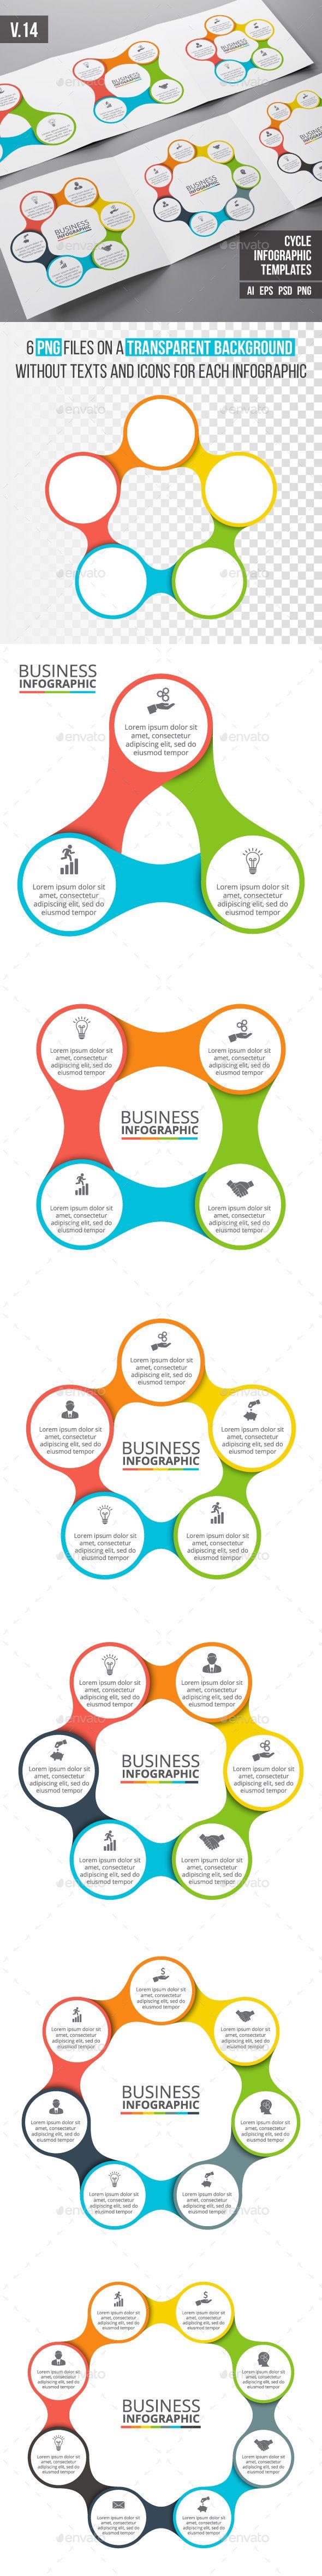 Infographics Template Set - PSD, Transparent PNG, Vector EPS, AI Illustrator